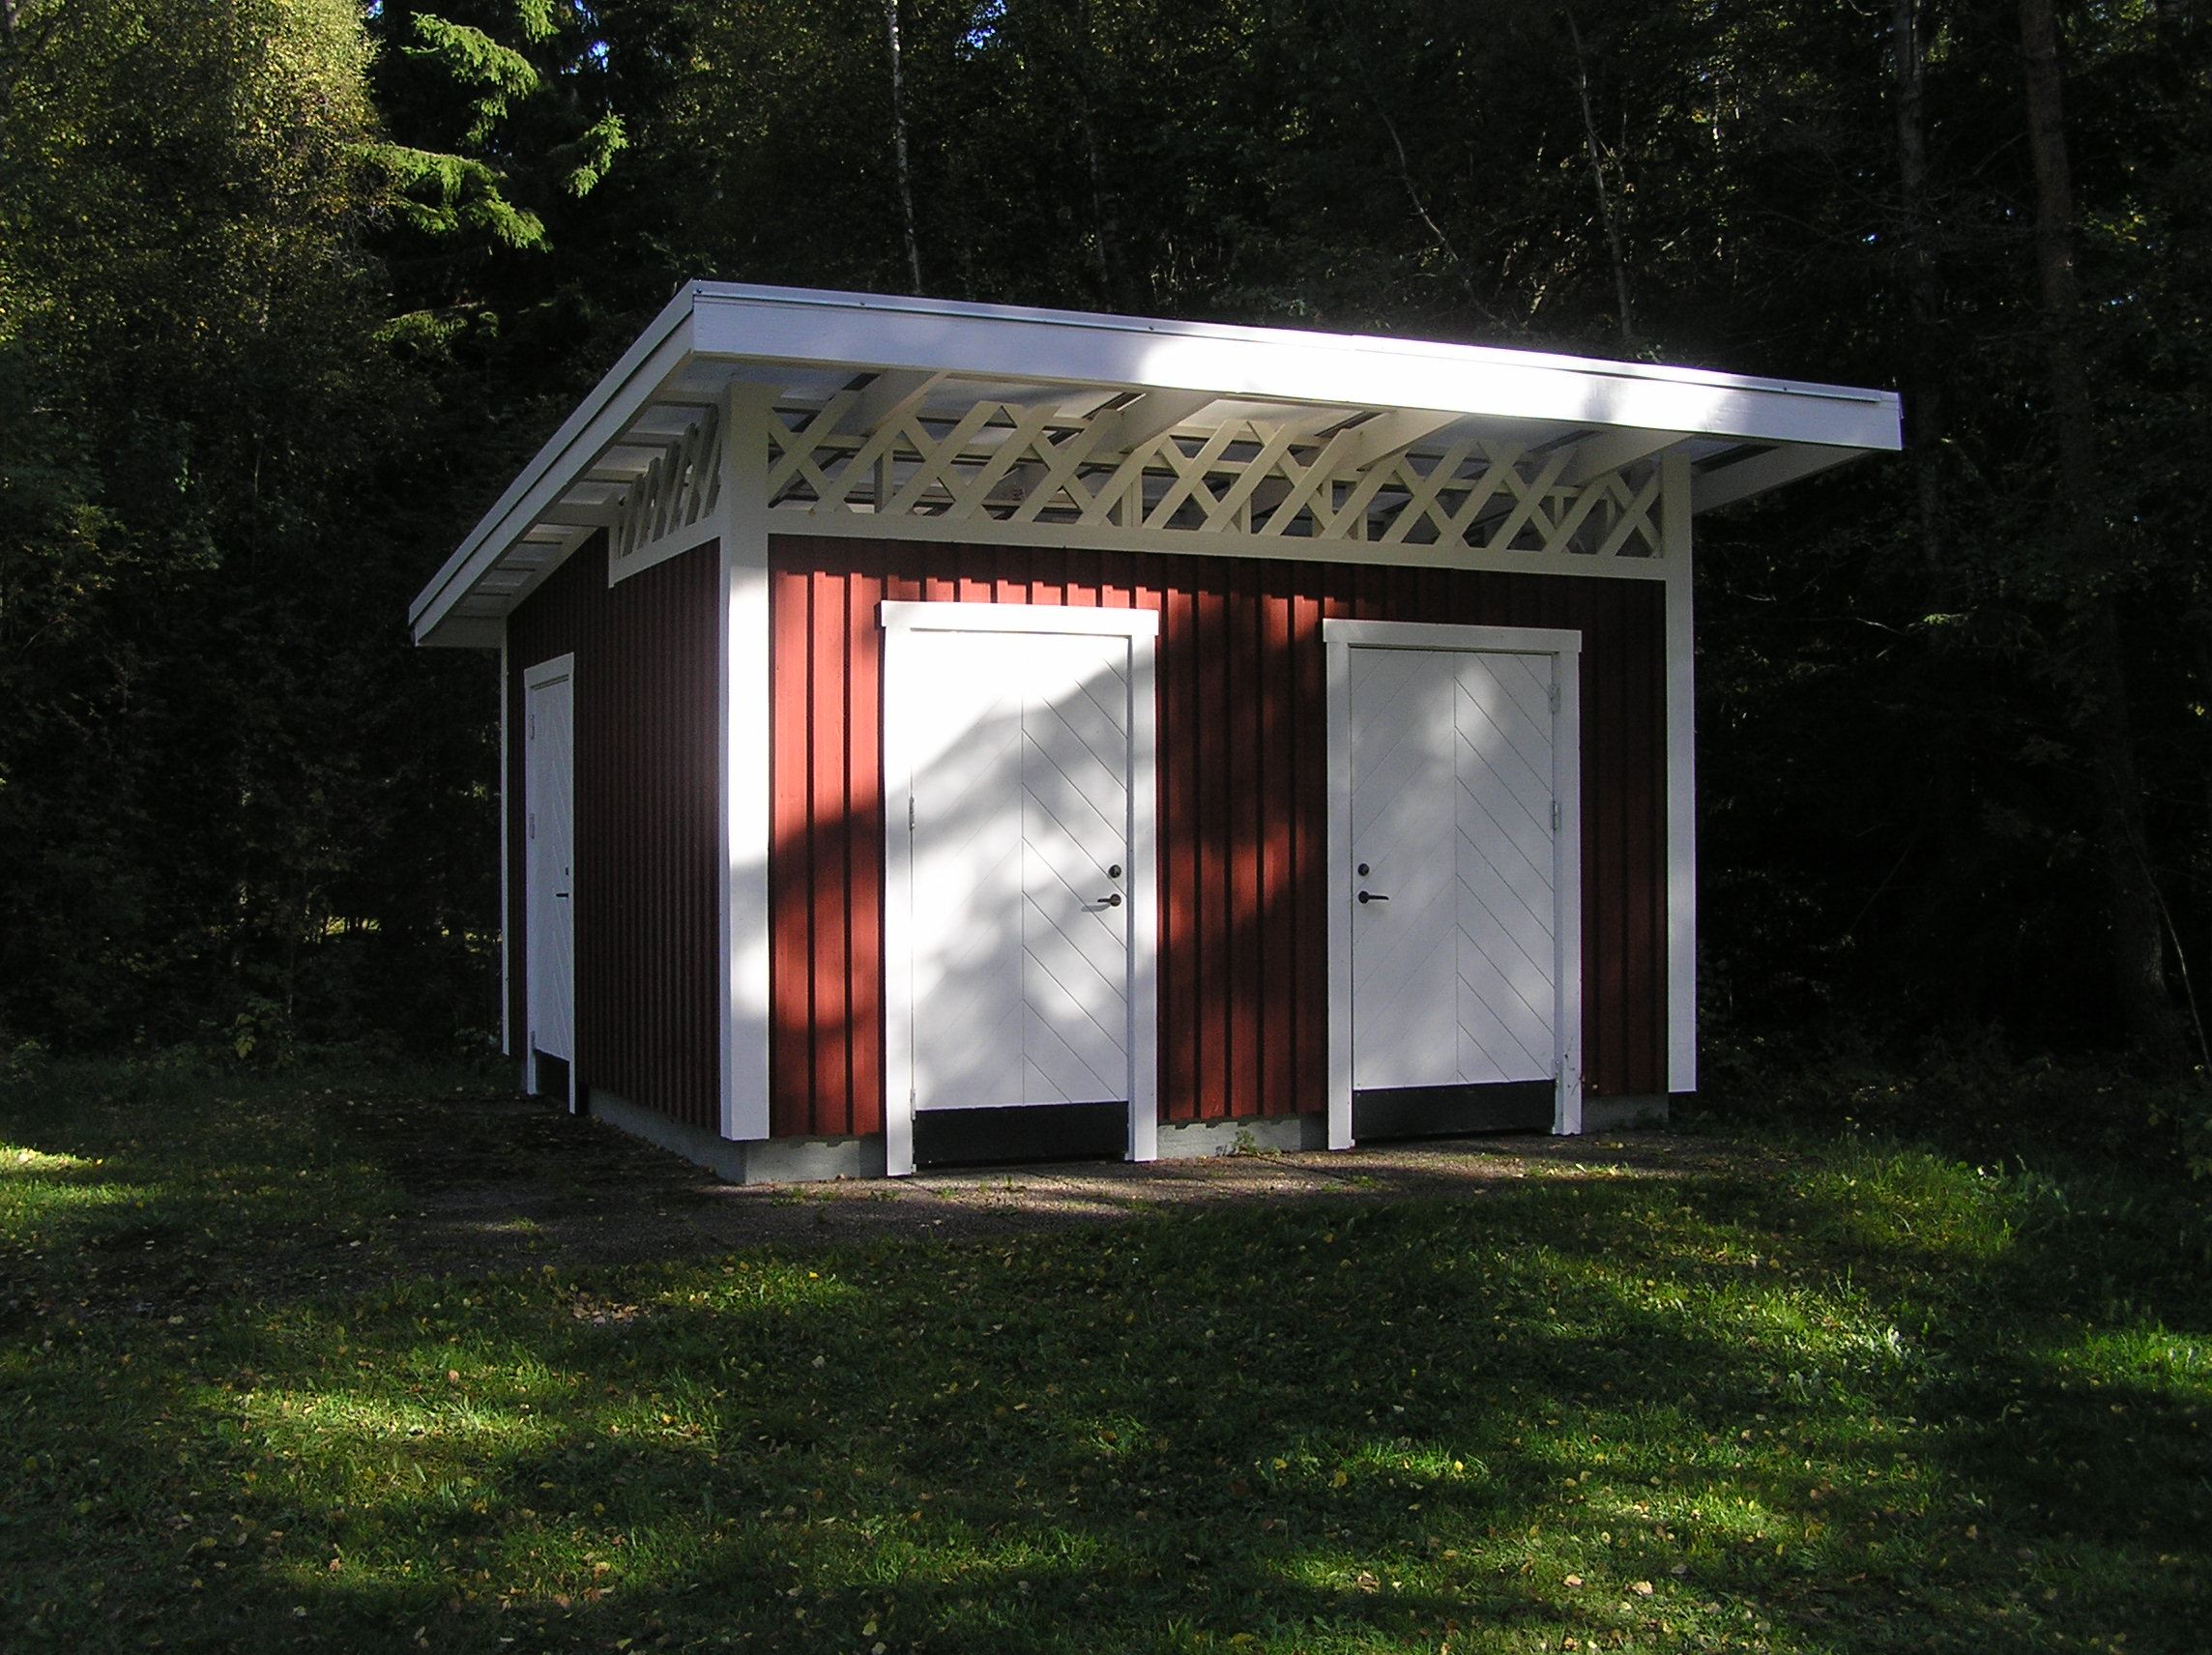 Vaggeryds kommun, Toaletter, 1 handikappsanpassad